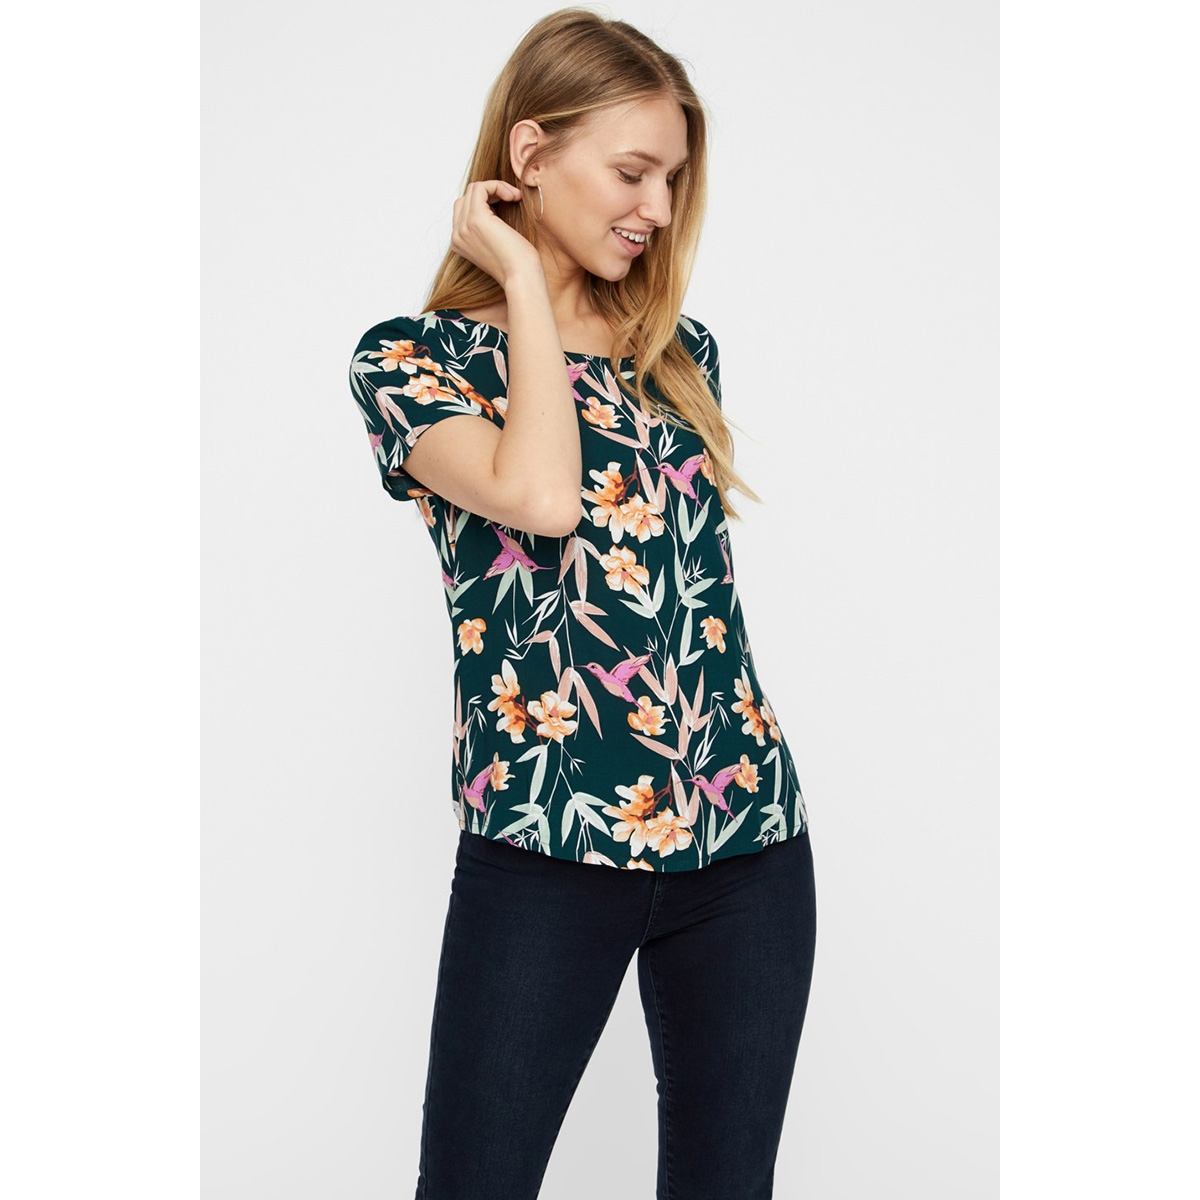 vmsimply easy ss top 10211480 vero moda t-shirt ponderosa pine/magnolia